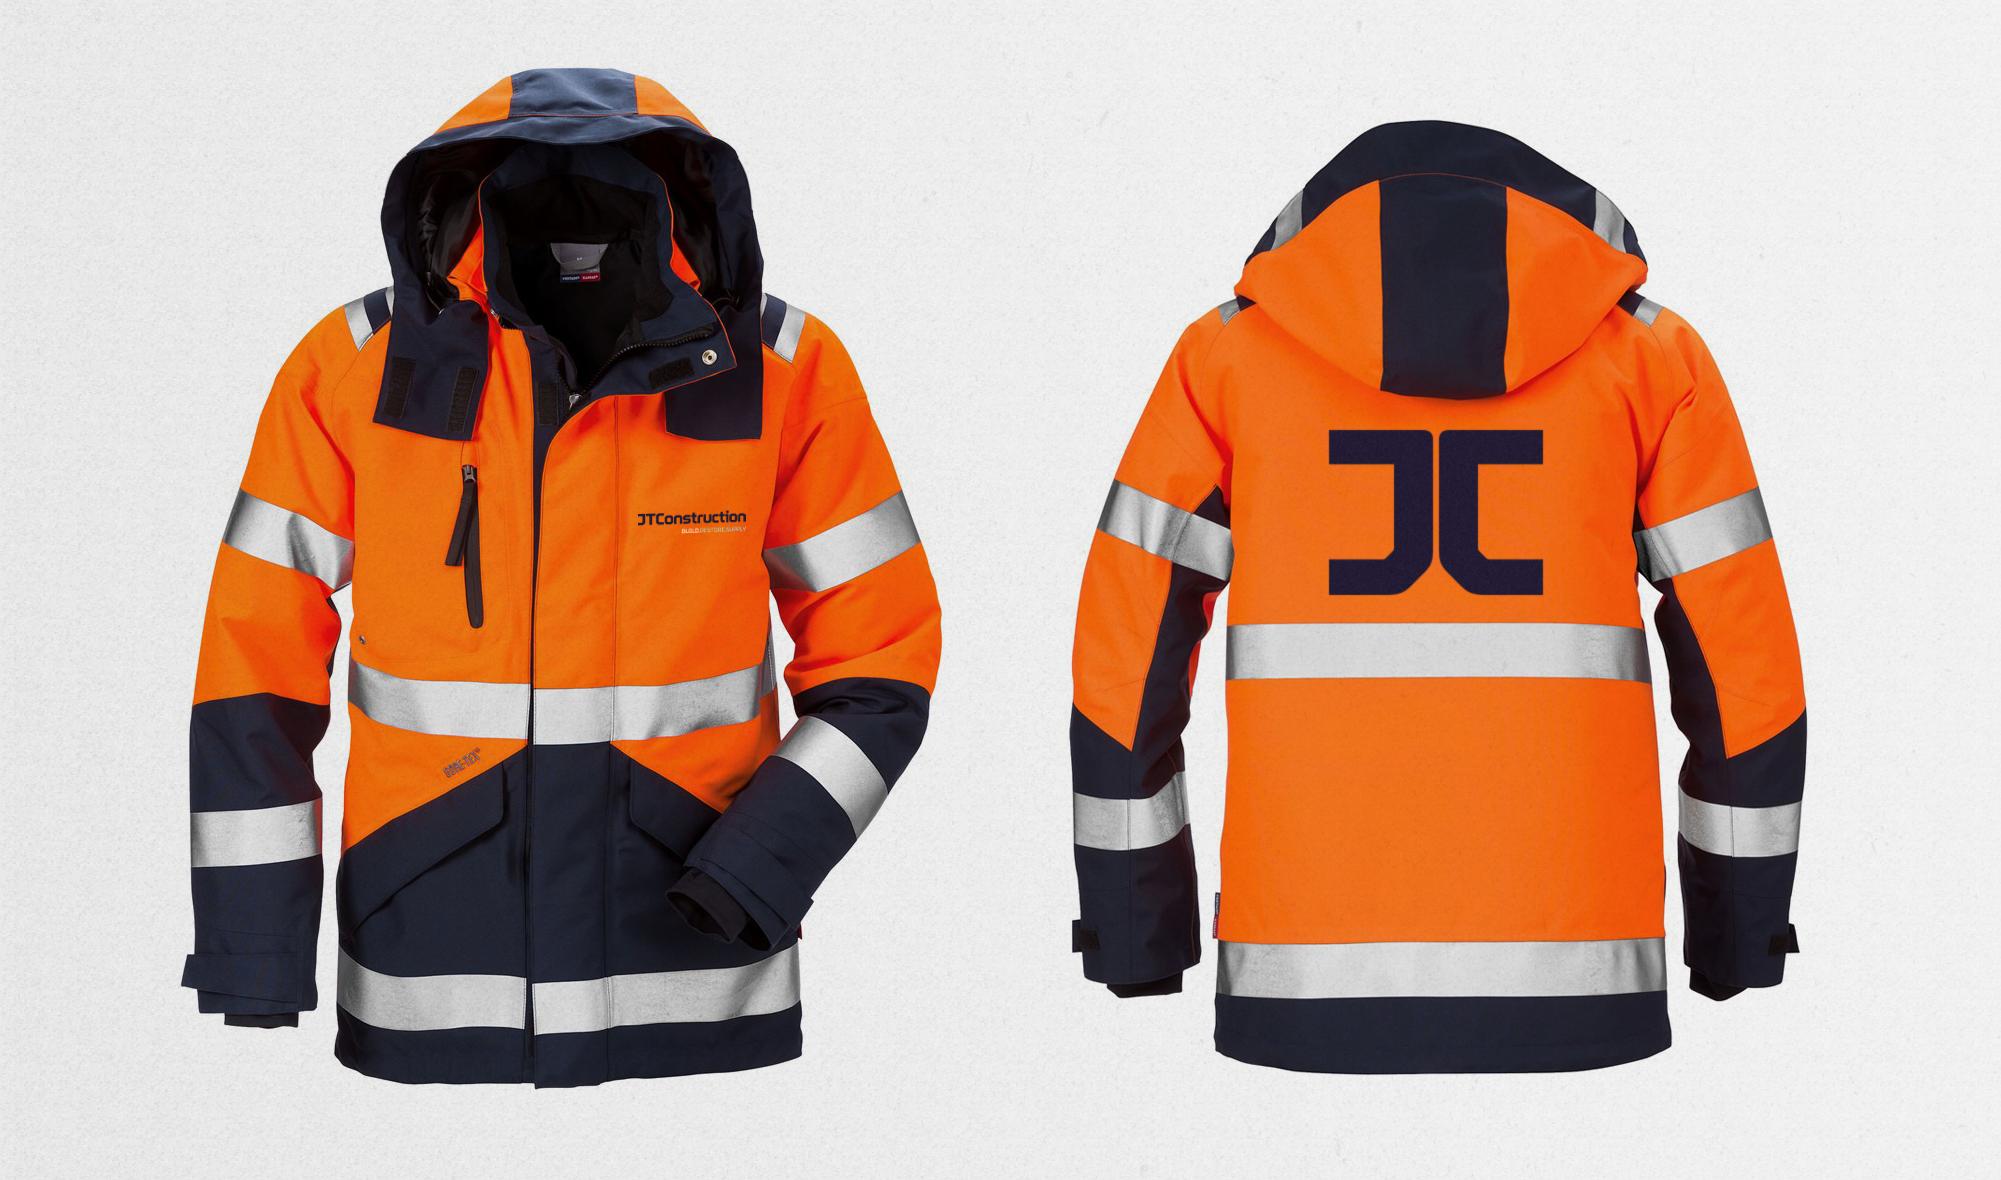 JTC_jacket.jpg